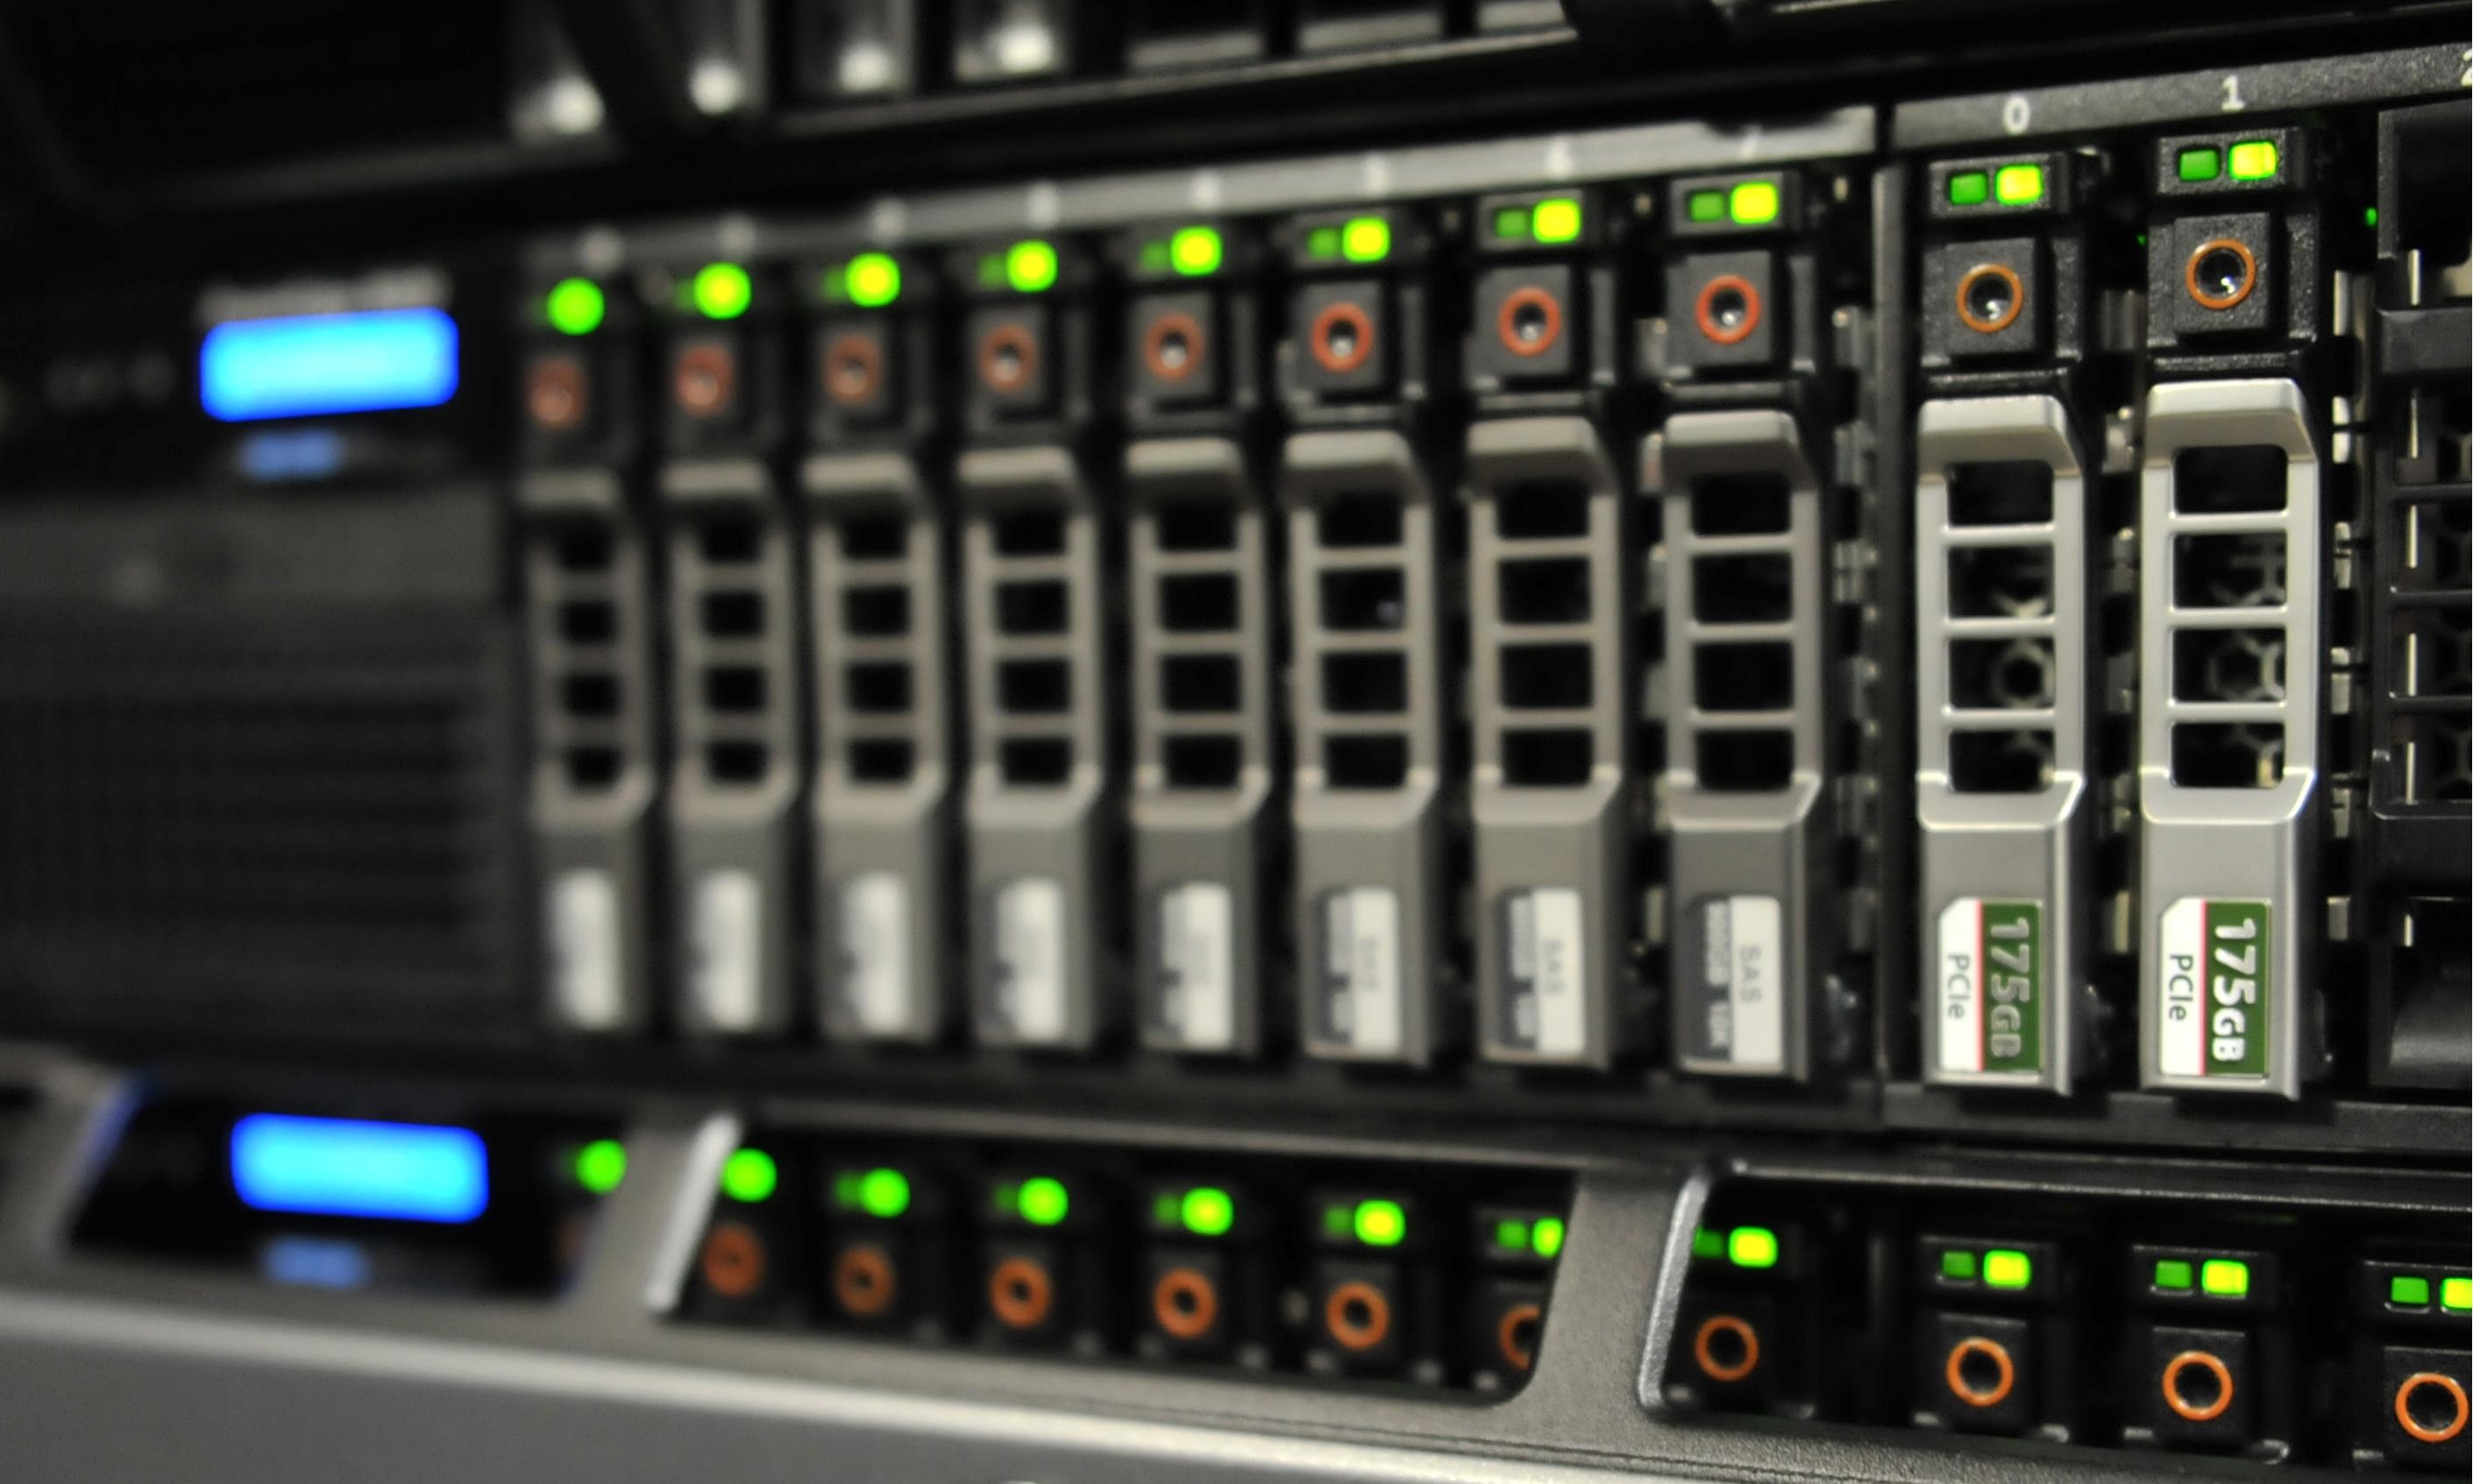 R820 1TB RAM compute node